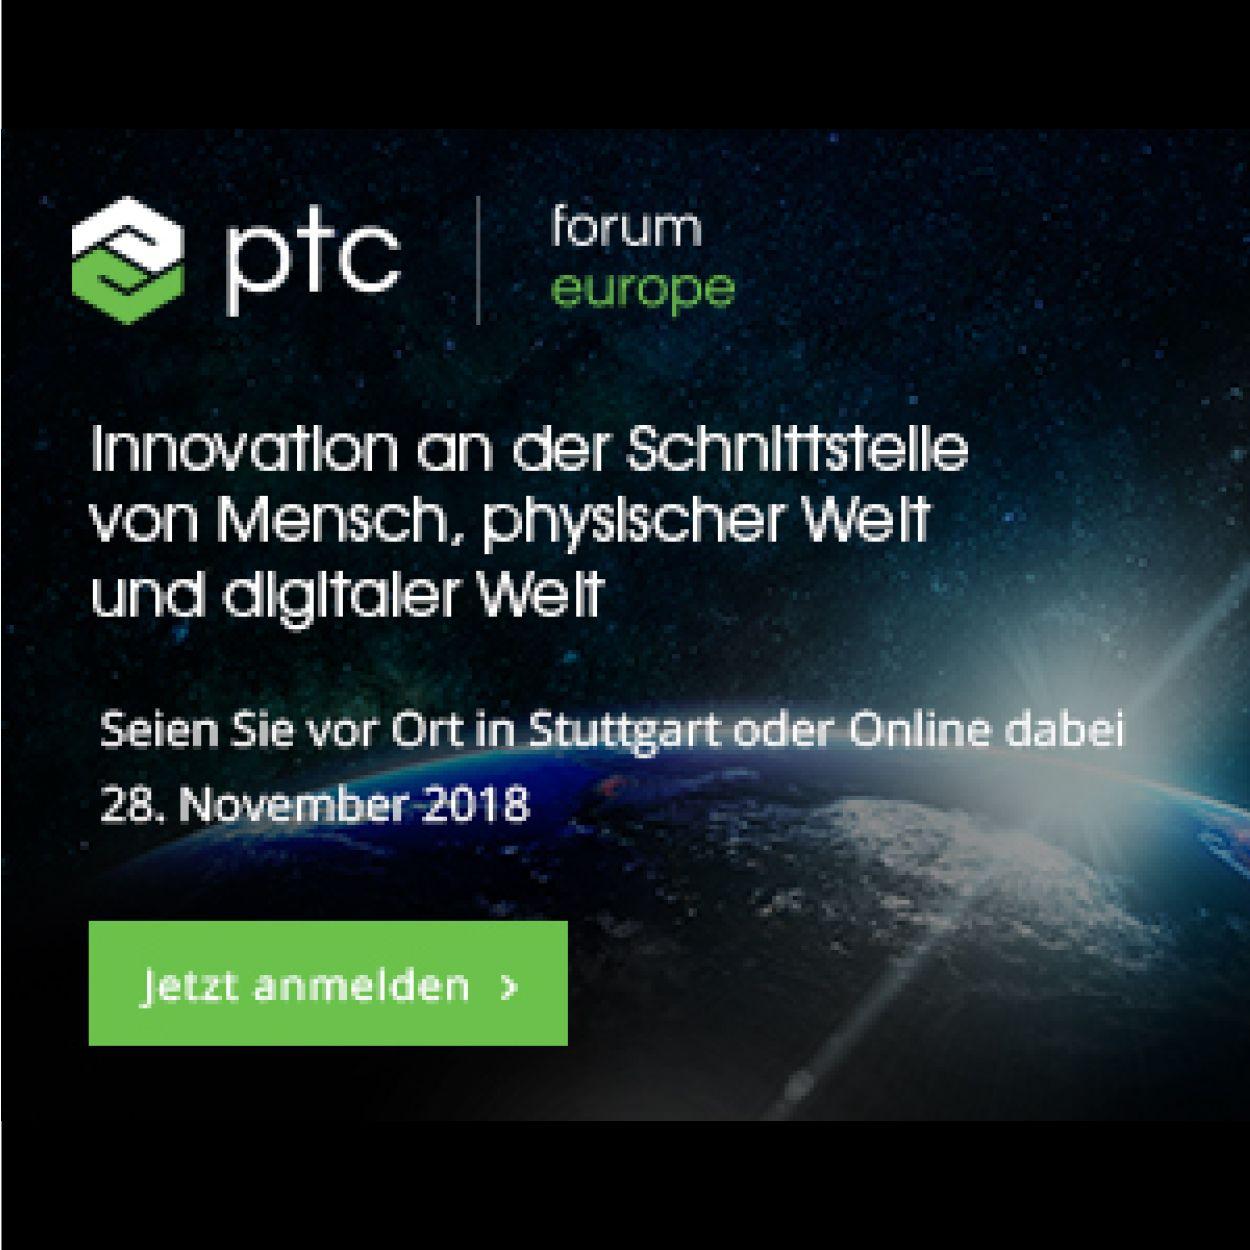 PTC Forum Europe